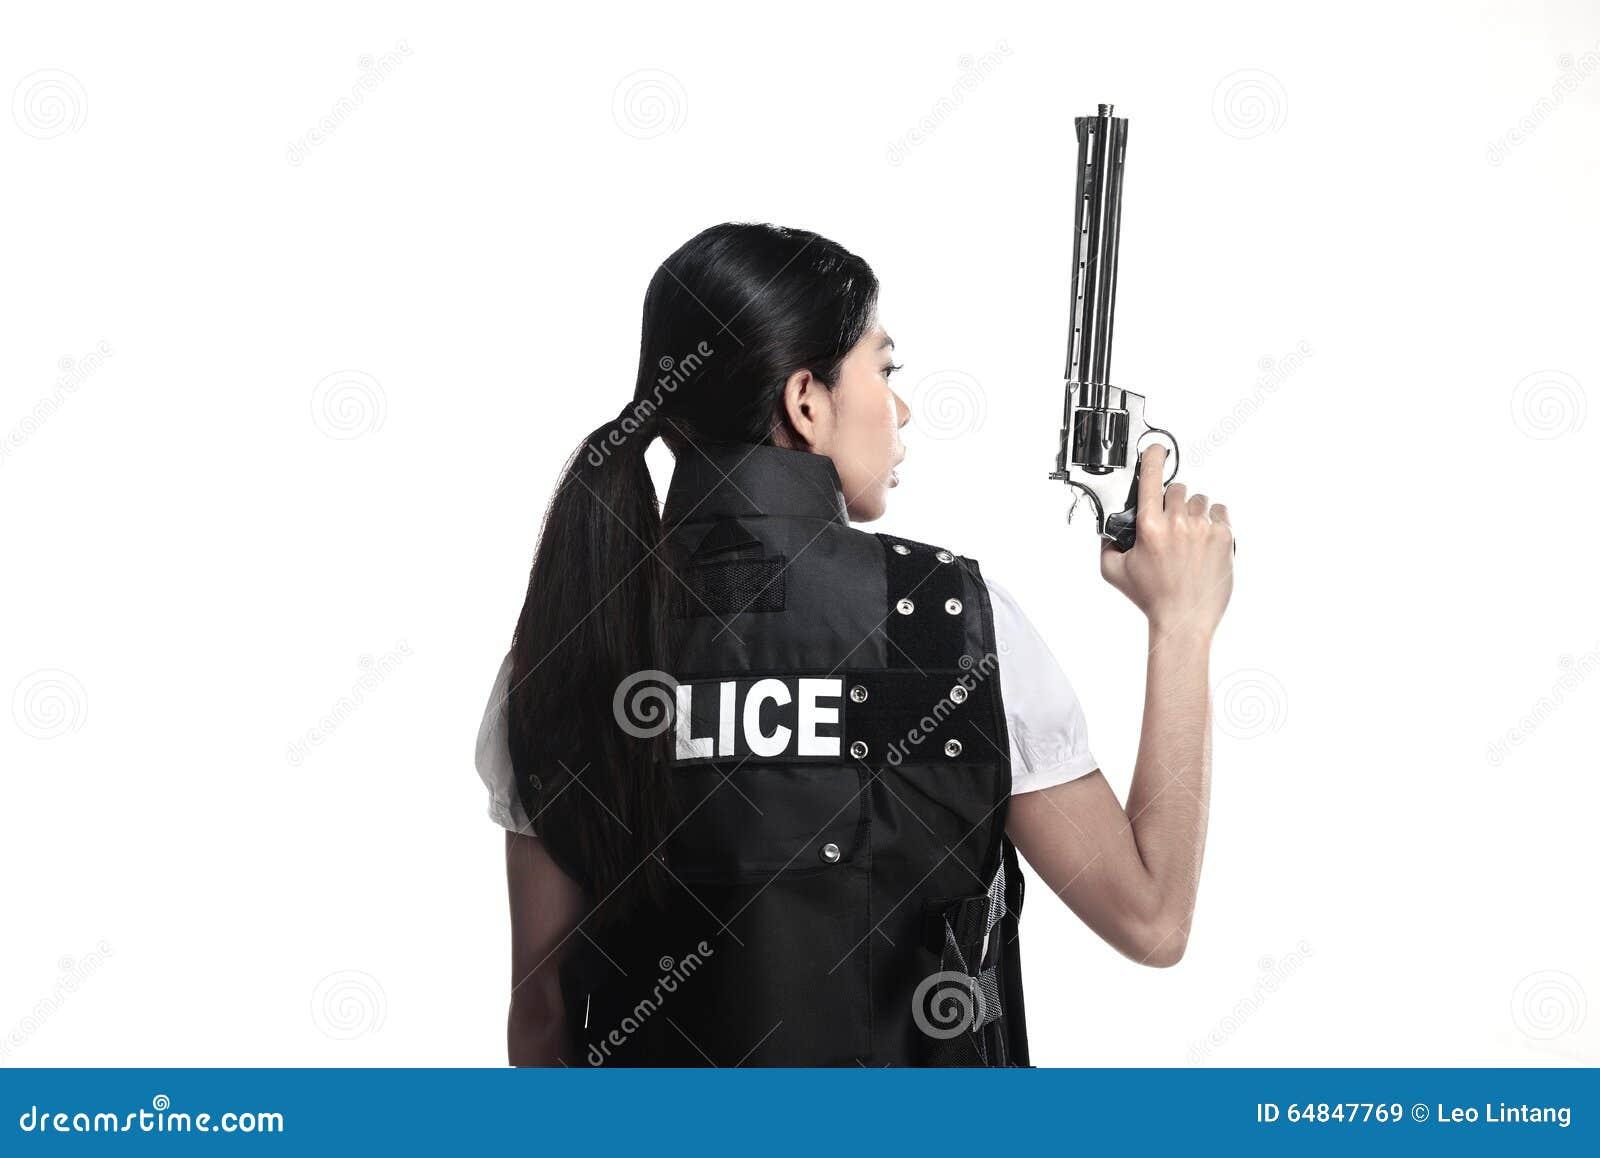 Polizistingriff-Revolvergewehr